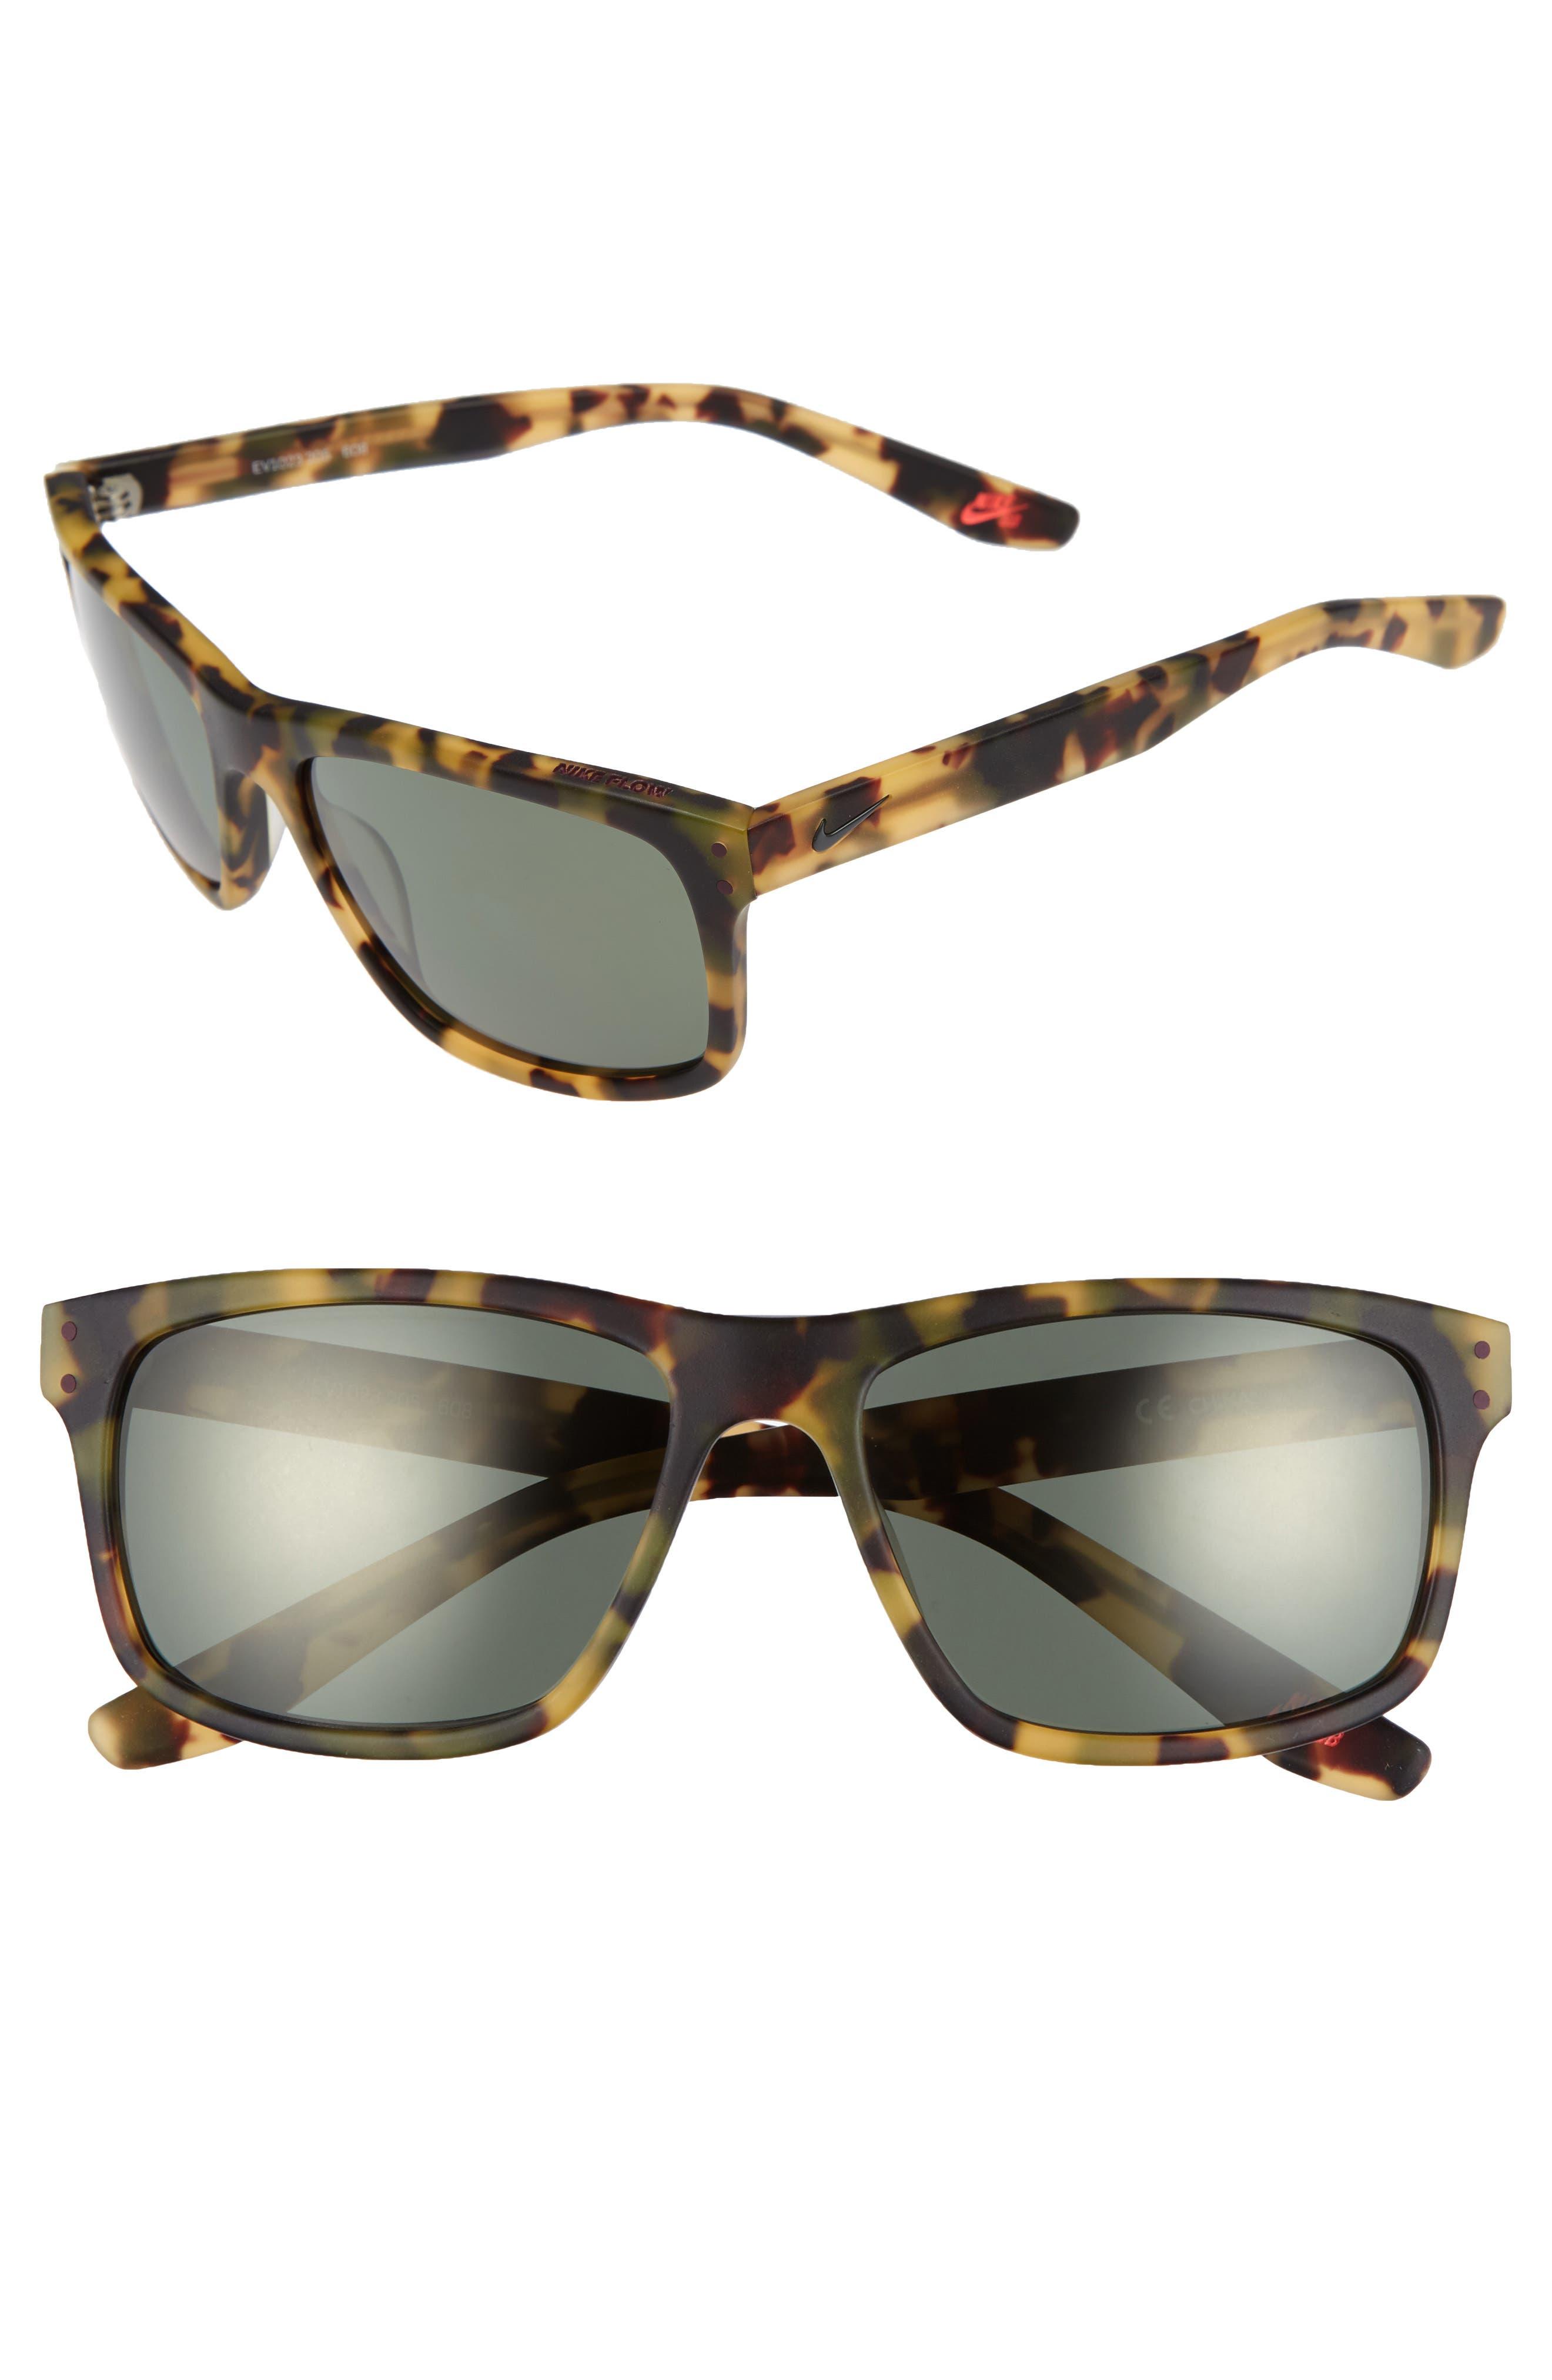 Nike Flow 58mm Sunglasses